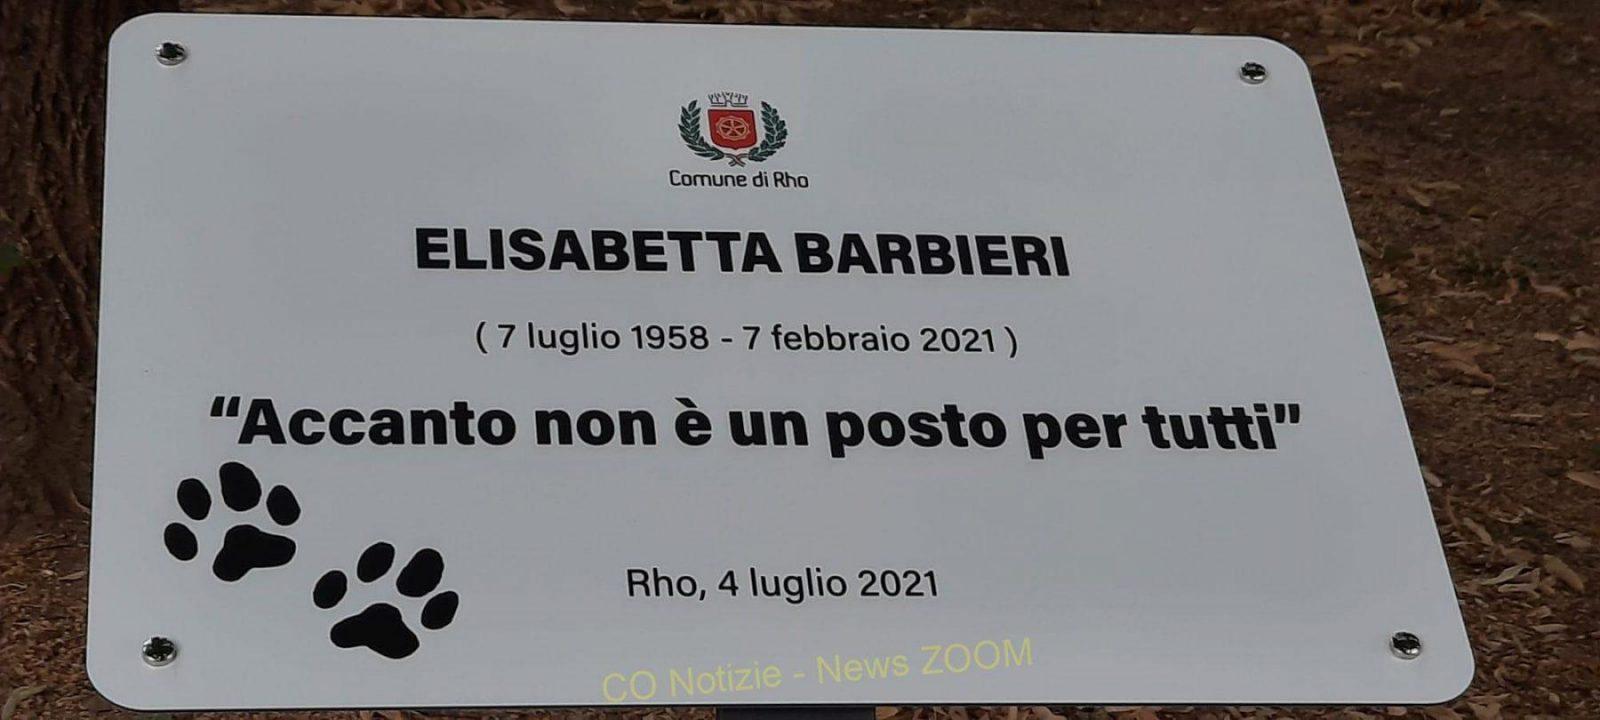 elisabetta barbieri Milano provincia - La città di Rho dedica un giardino alla staffettista Elisabetta Barbieri 05/07/2021